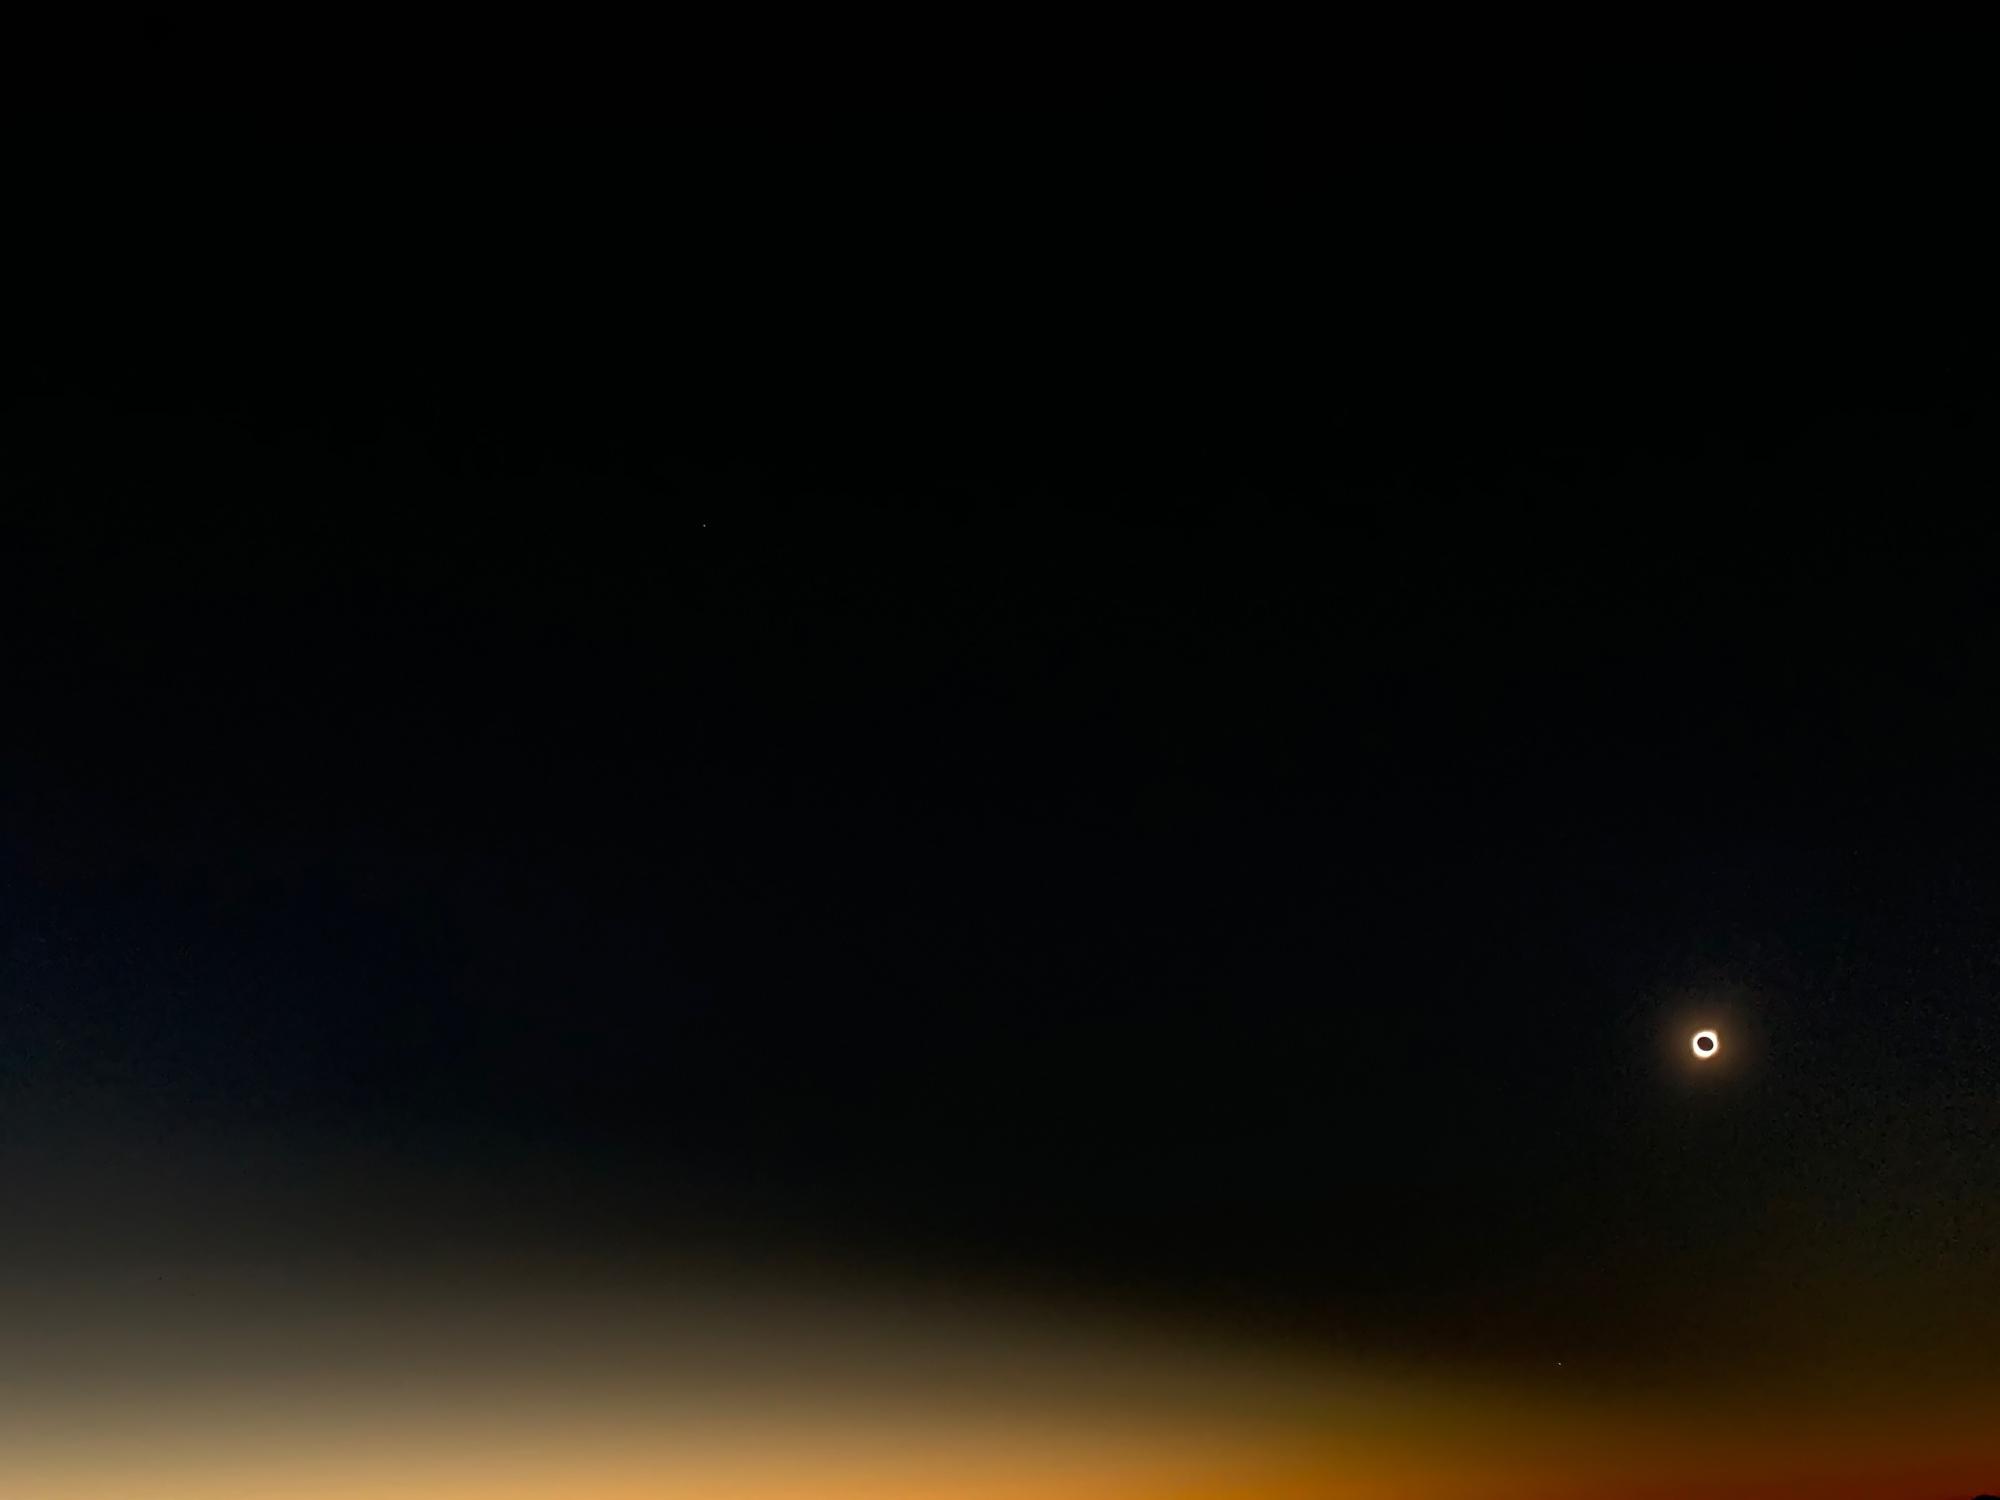 5d1f0b06eca2b_eclipse2032N1B1send.thumb.jpg.43ccc47897f8ce39891b6bea5d2e093c.jpg